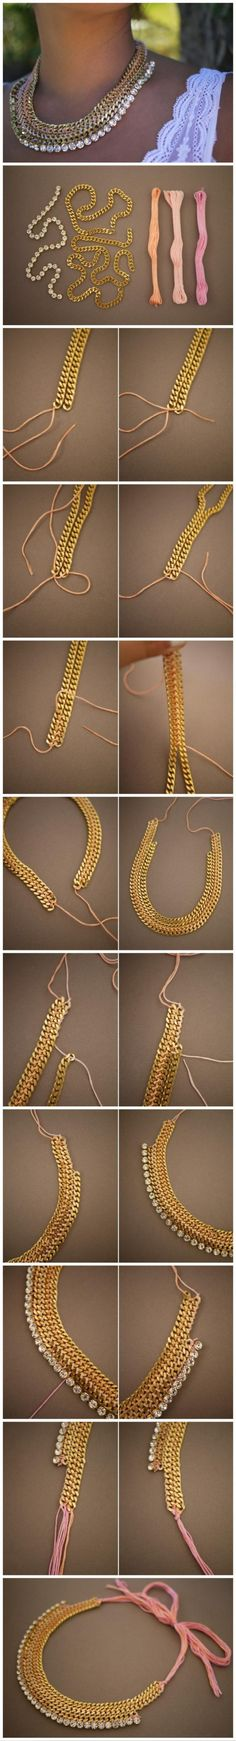 DIY Woven Chain Collar Necklace